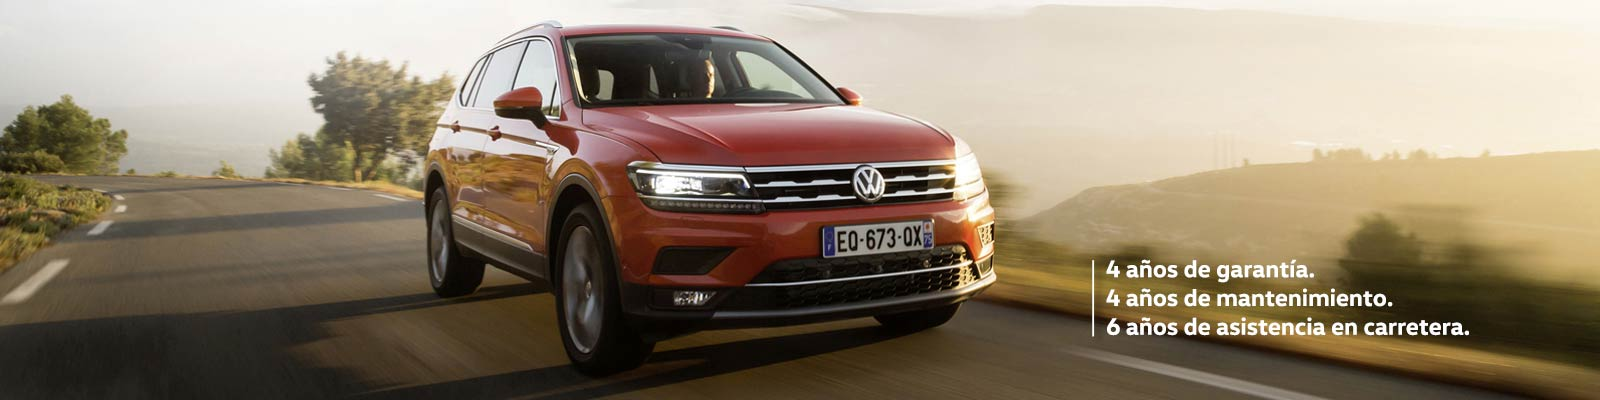 Volkswagen TIGUAN EDITION 2.0 TDI 115 CV